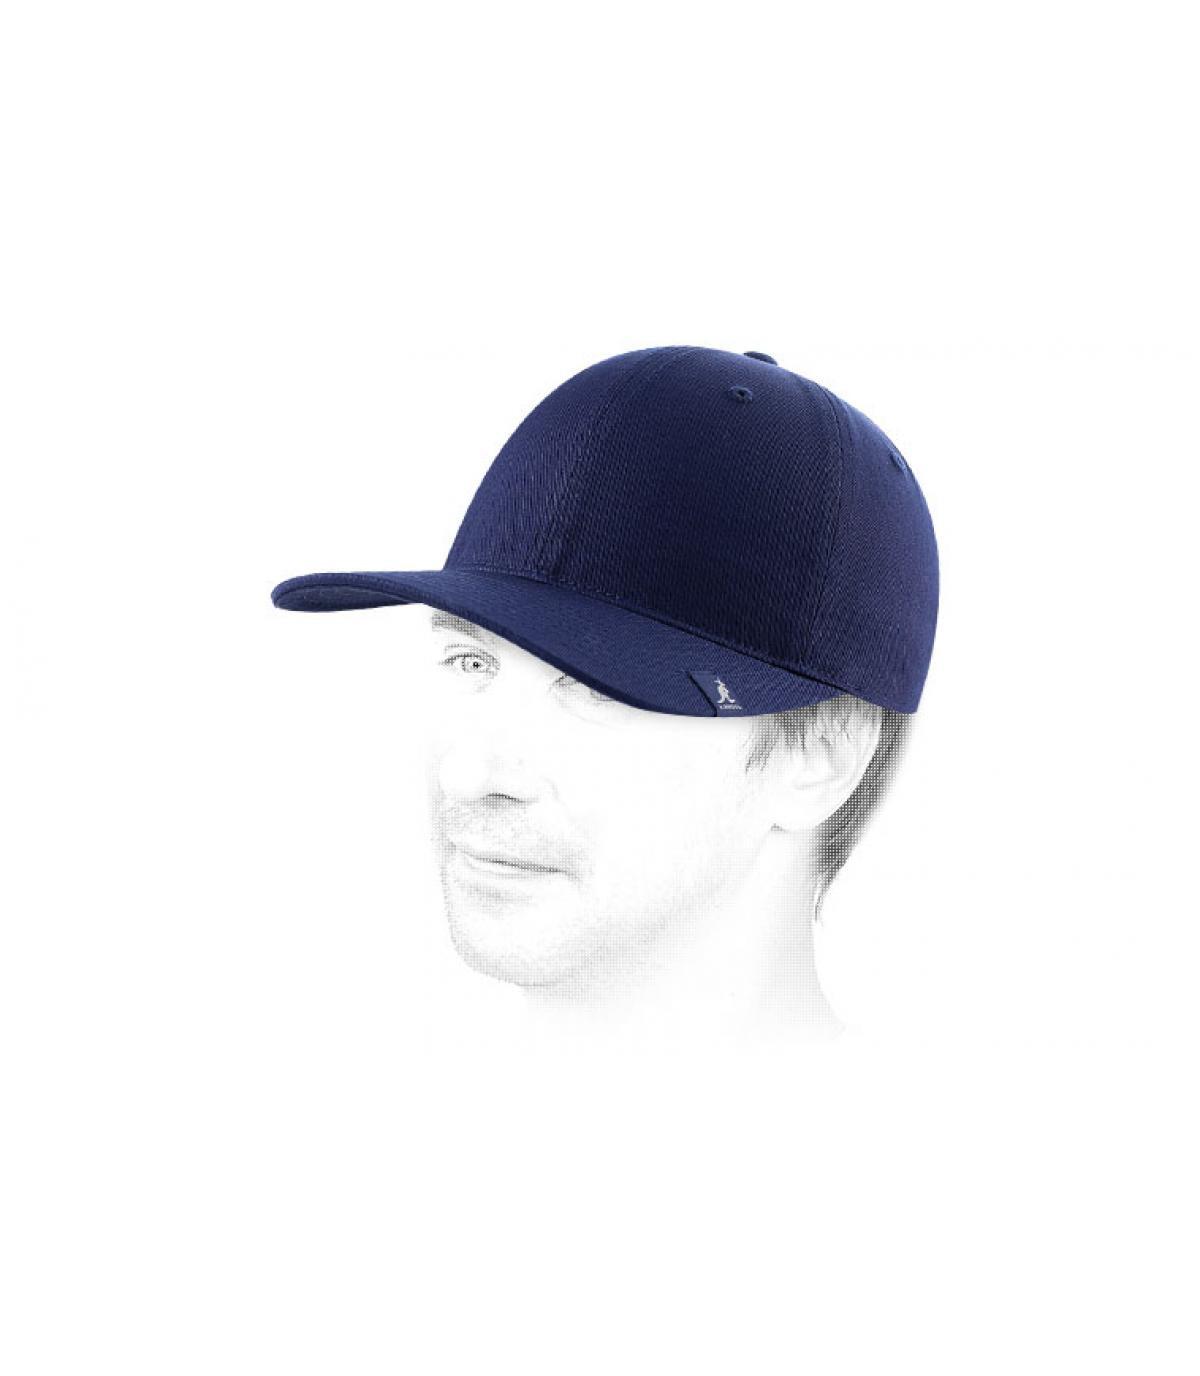 Gorro baseball azul marine